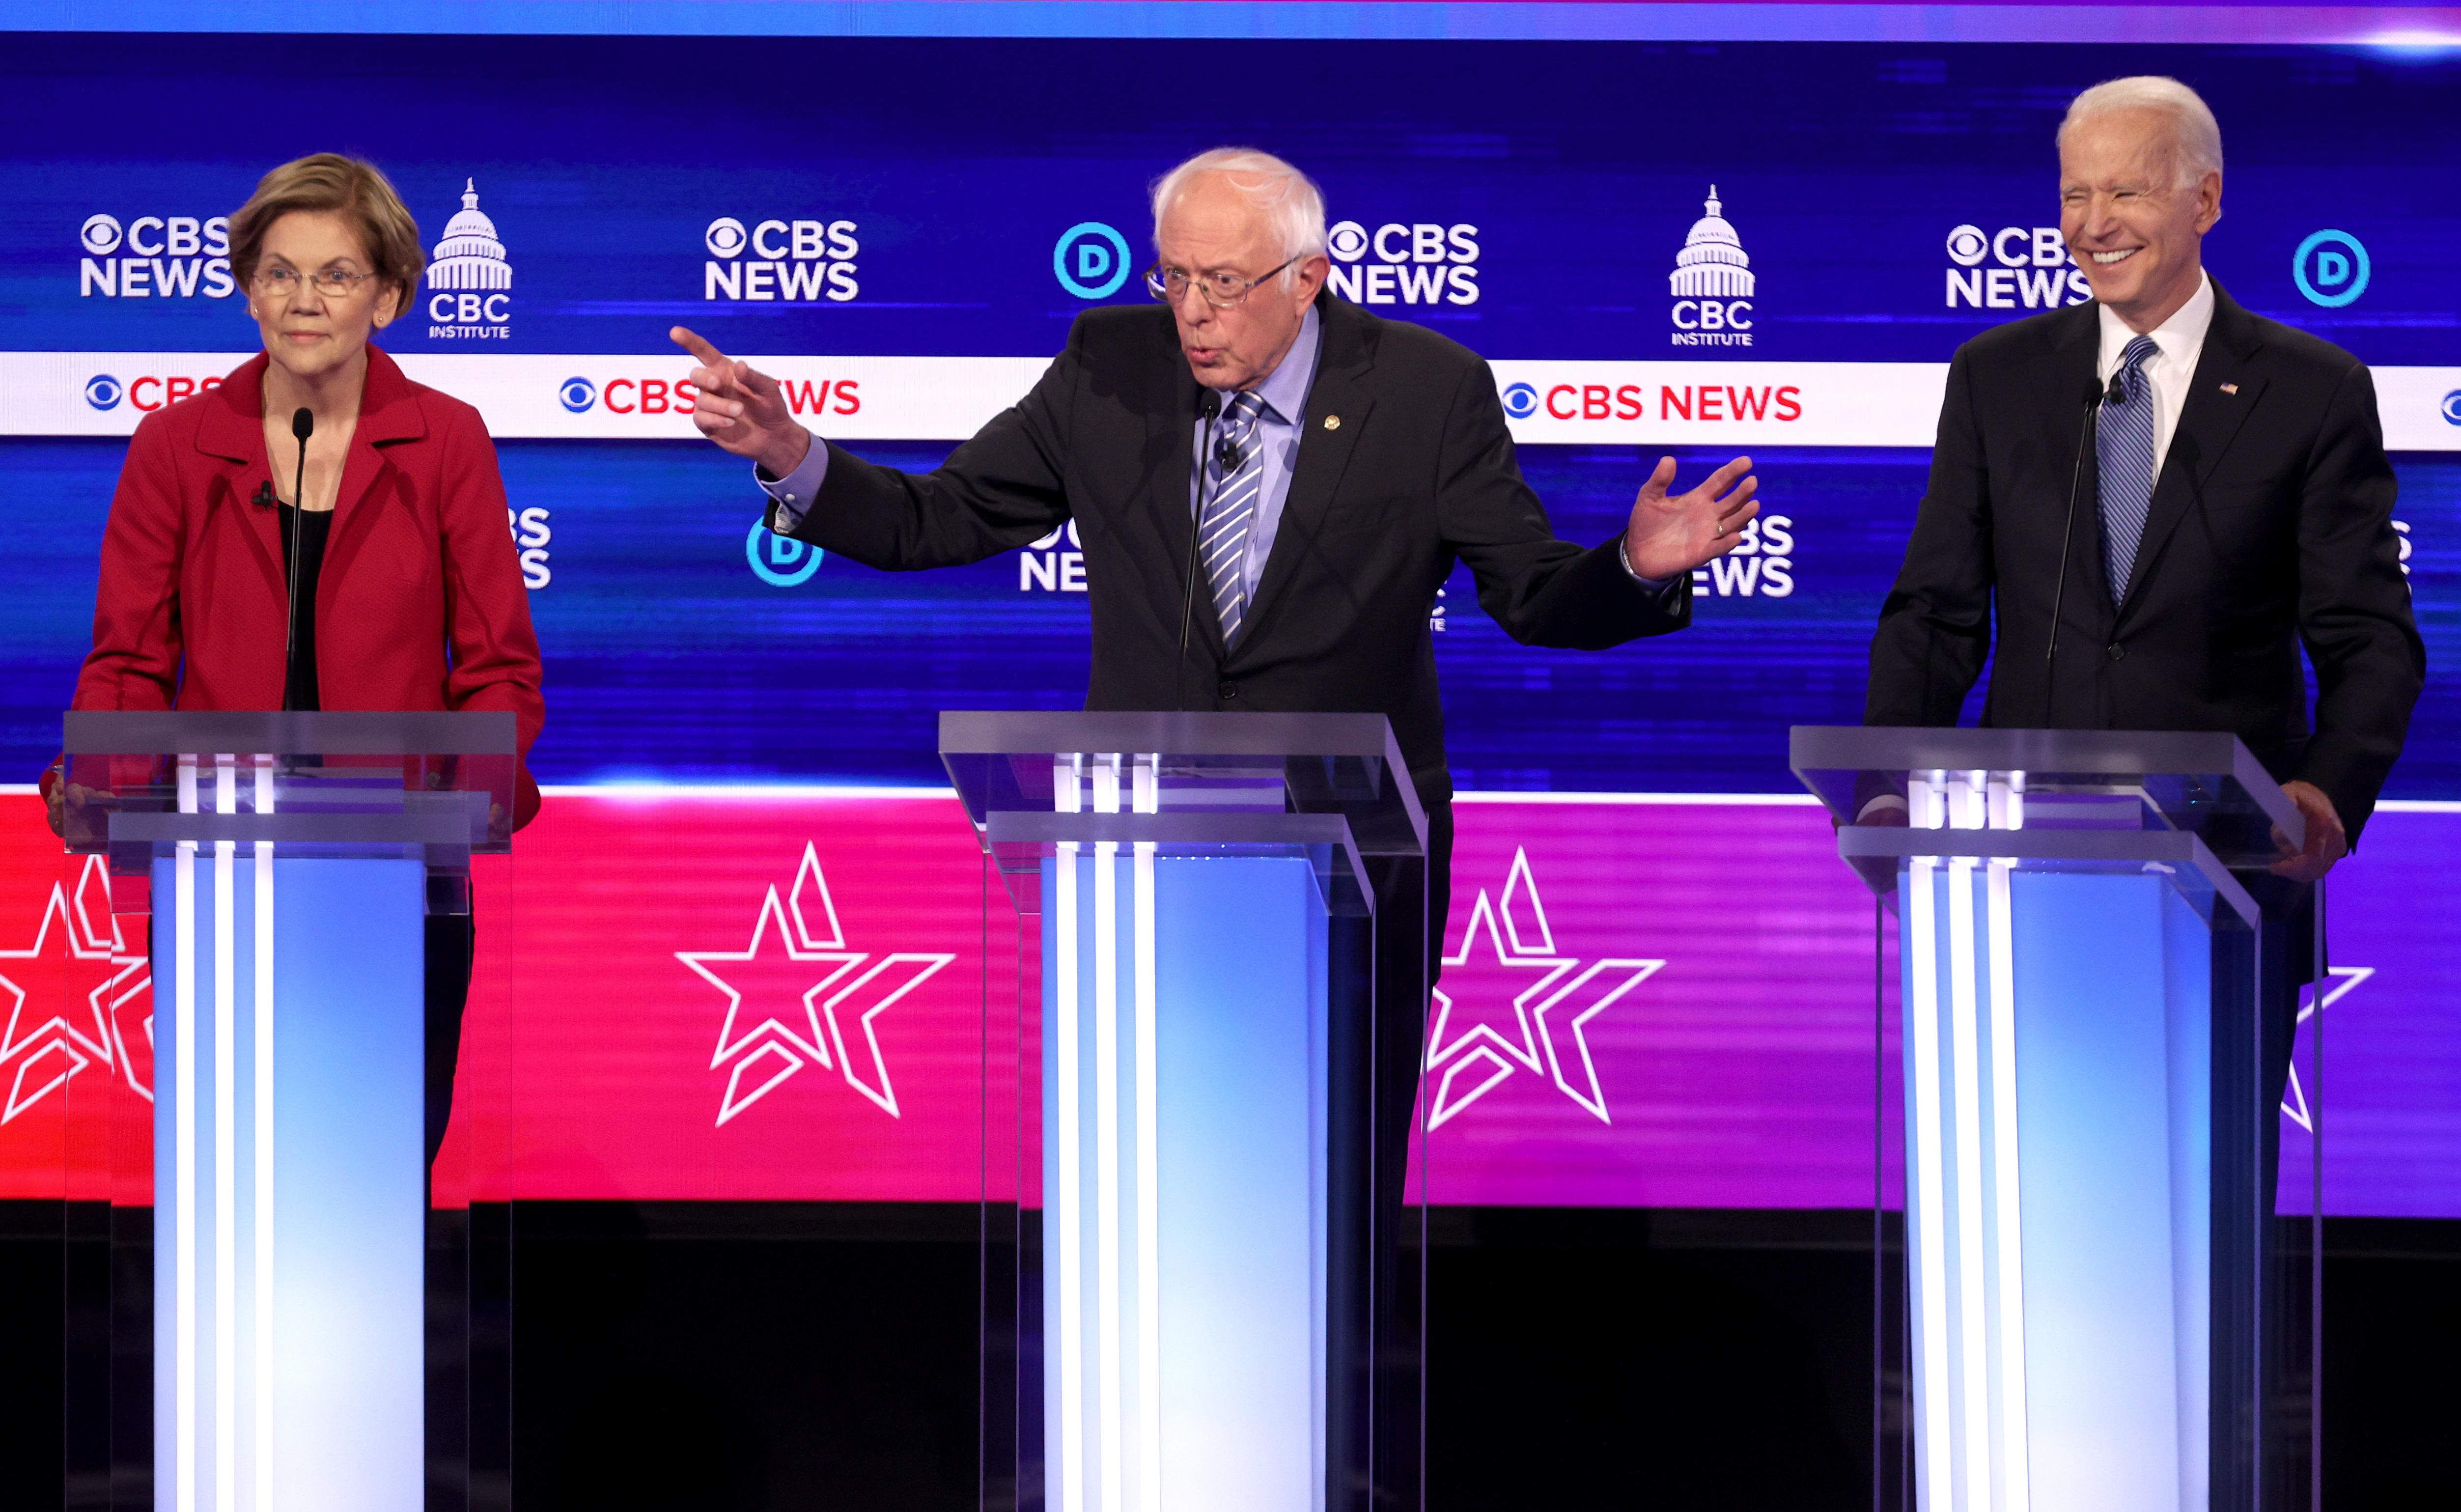 4 Takeaways From The South Carolina Democratic Debate